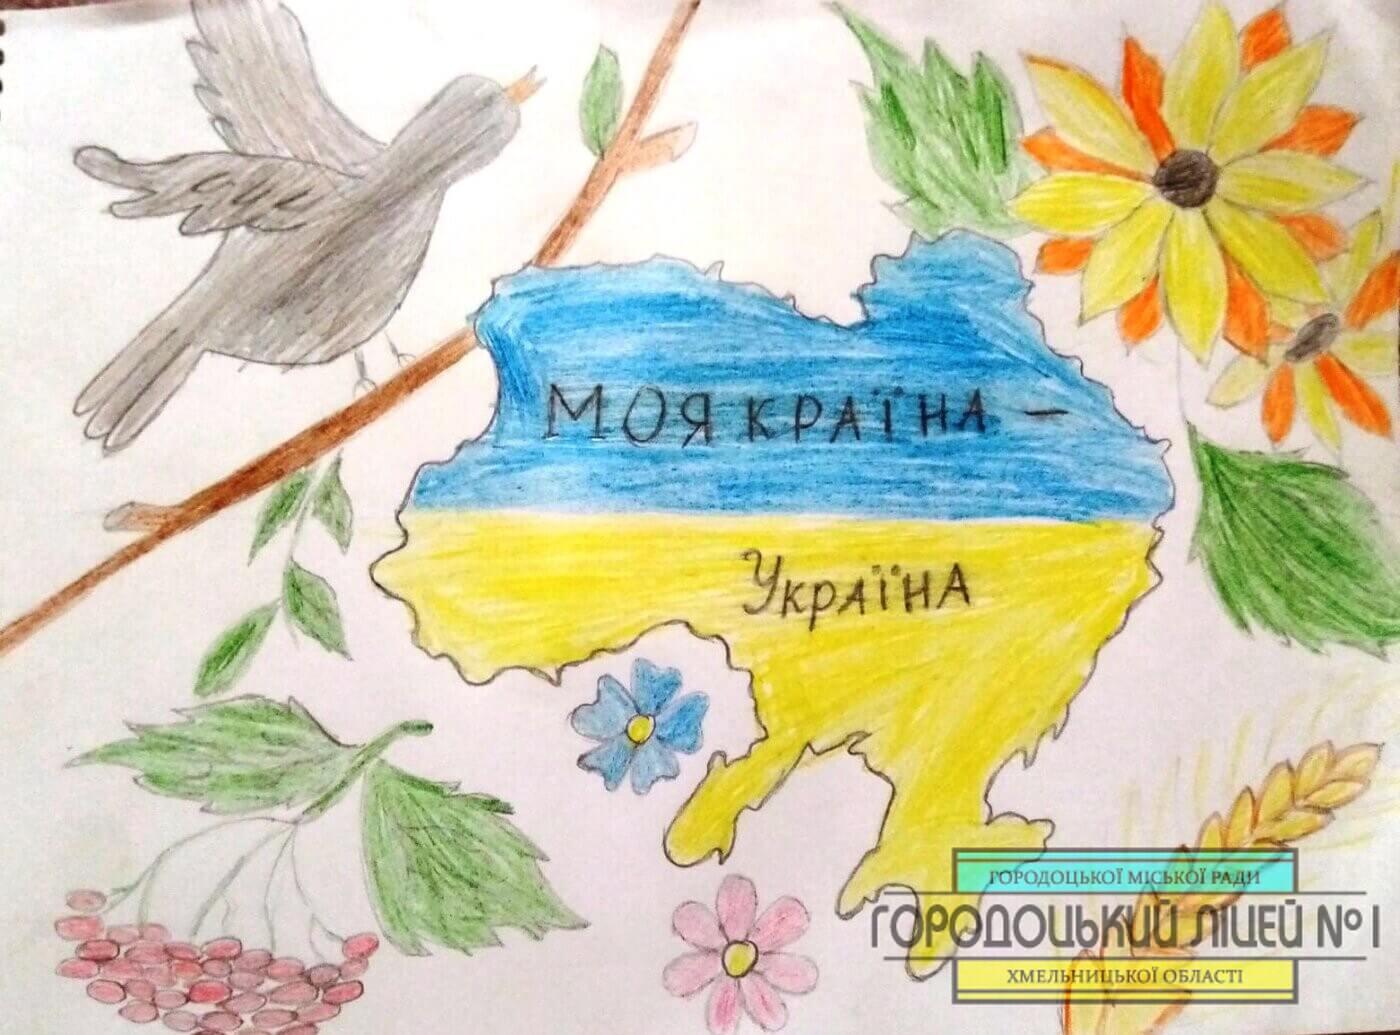 zobrazhennya viber 2021 01 25 13 53 38 1400x1035 - Велична і Соборна, моя ти Україно!